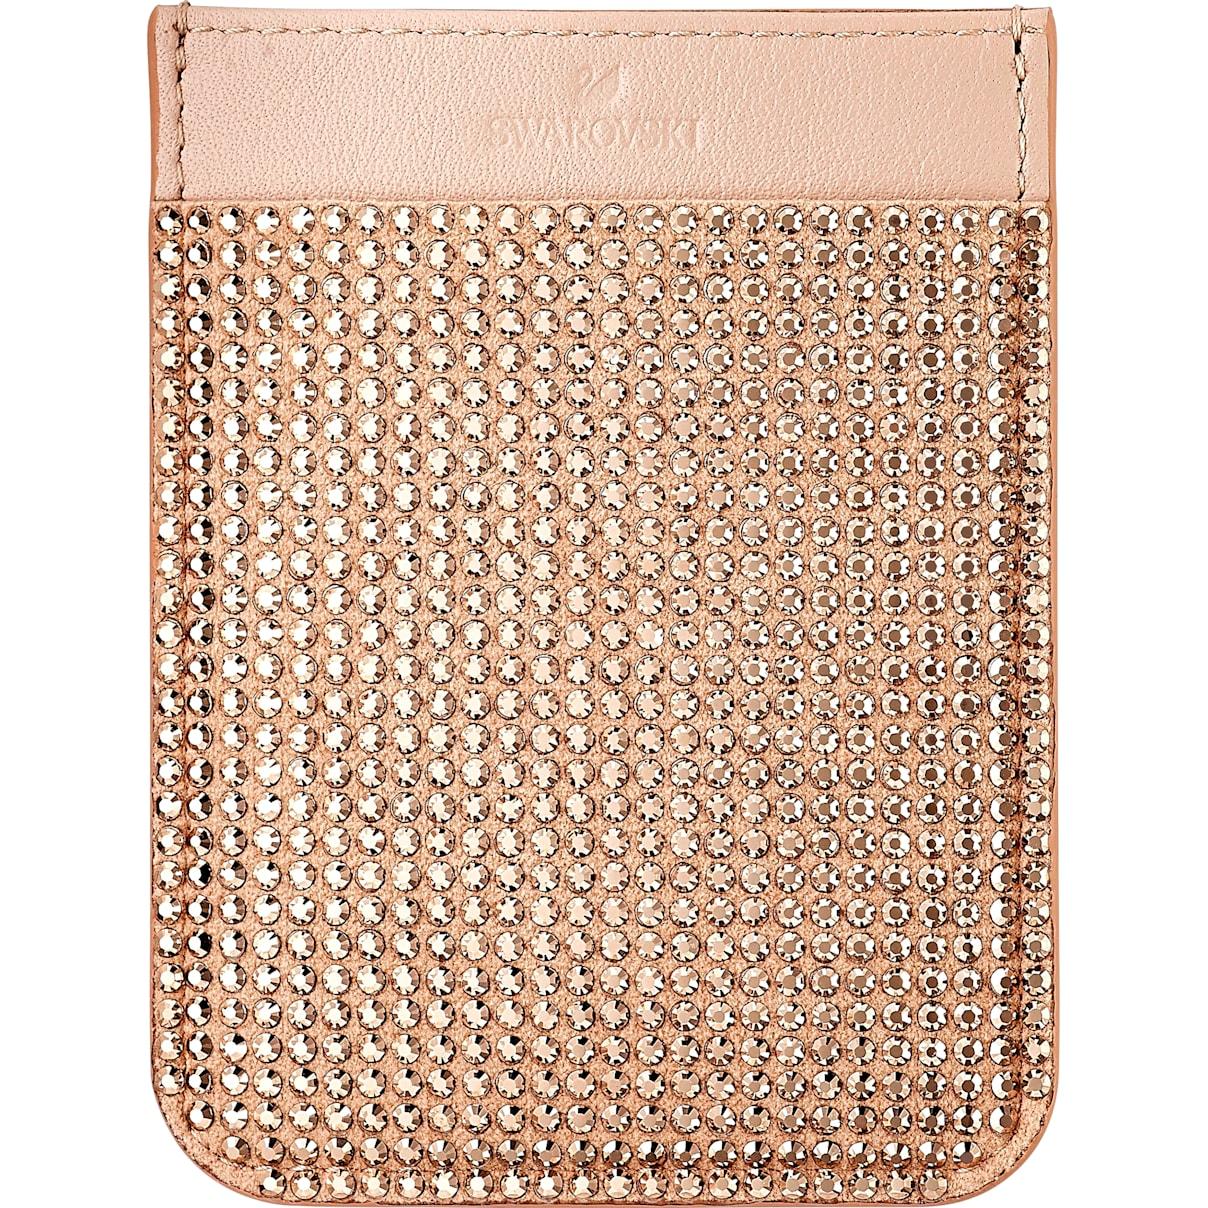 Swarovski Swarovski Smartphone sticker pocket, Rose Gold